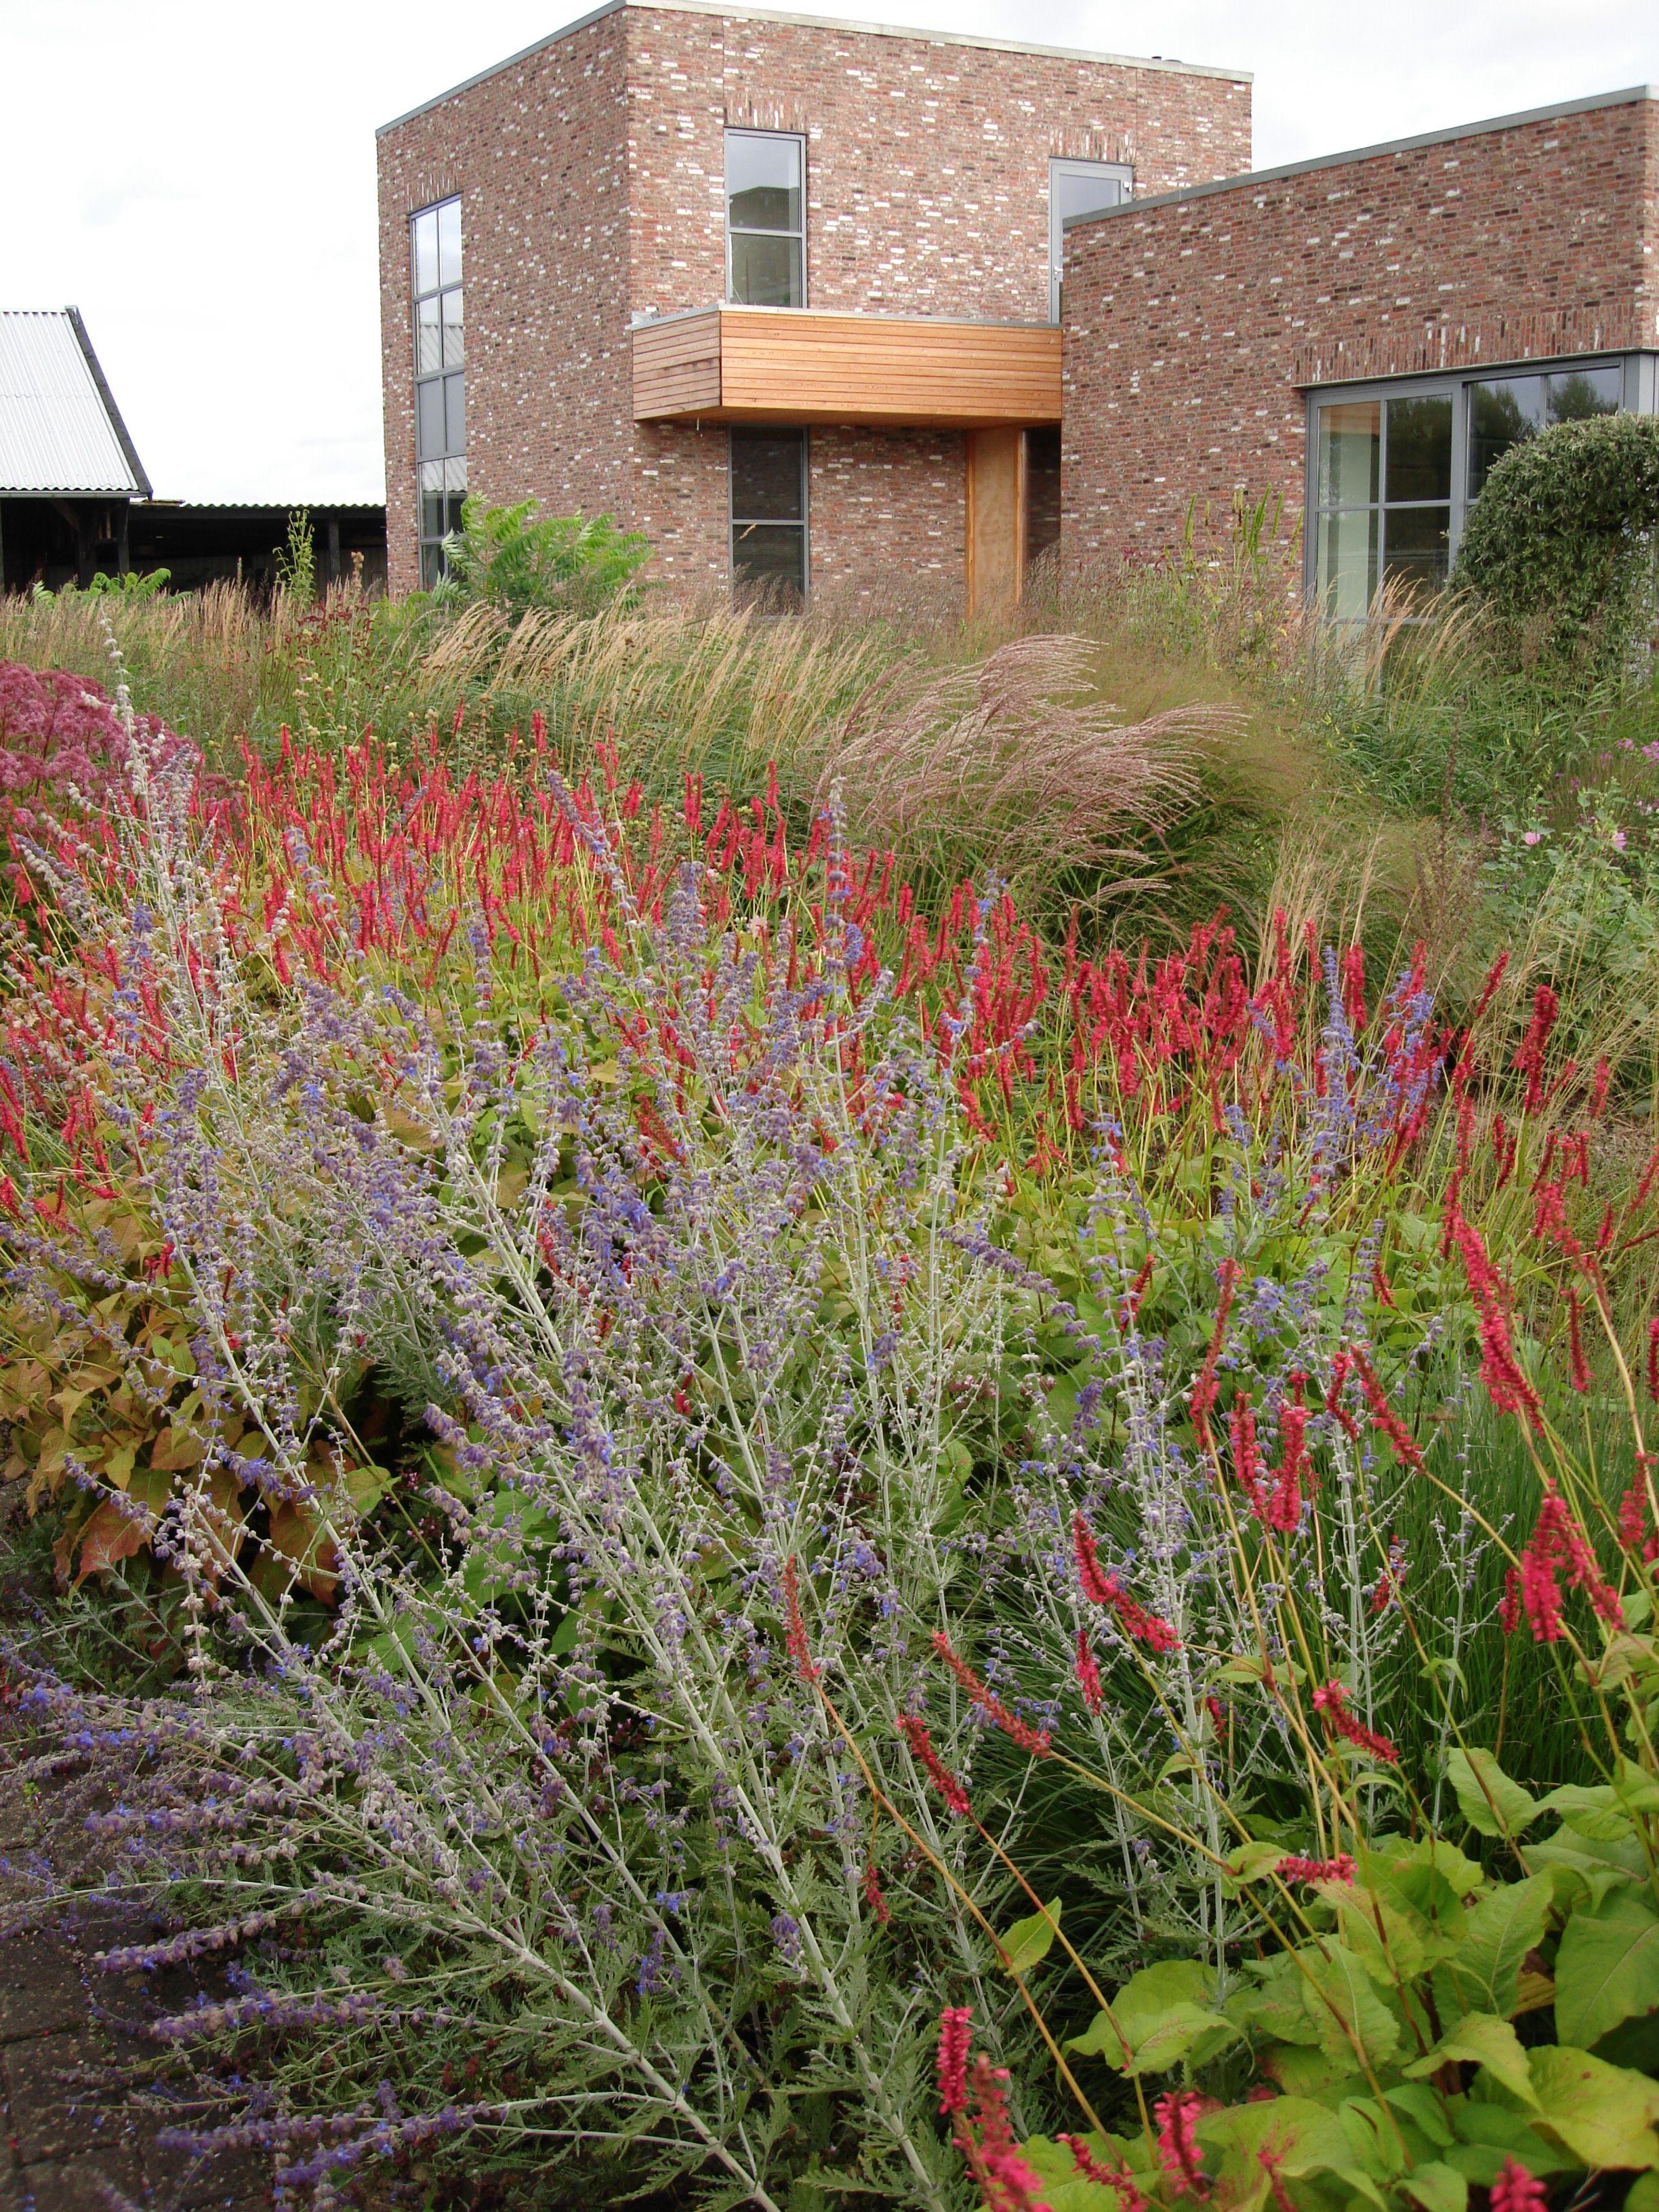 NL - Hummelo Garden Piet Oudolf   GARDENS   Pinterest   Gardens ...